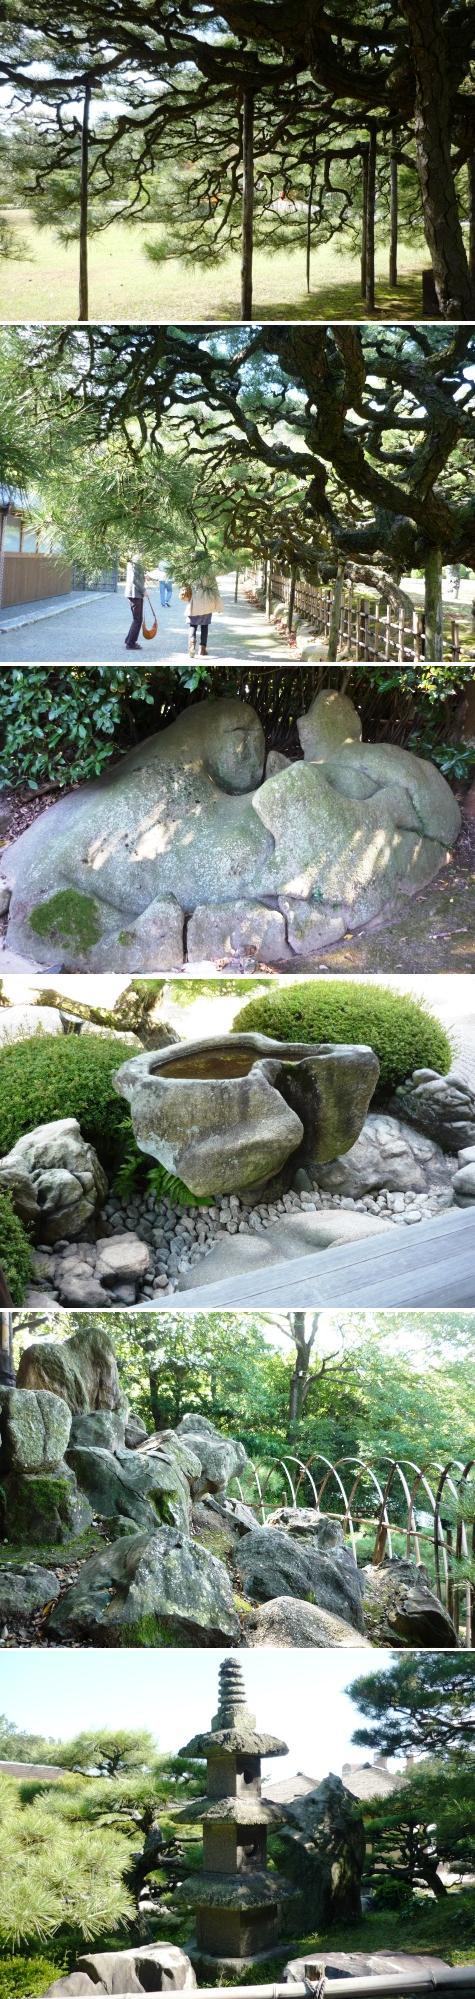 a松と石1330283